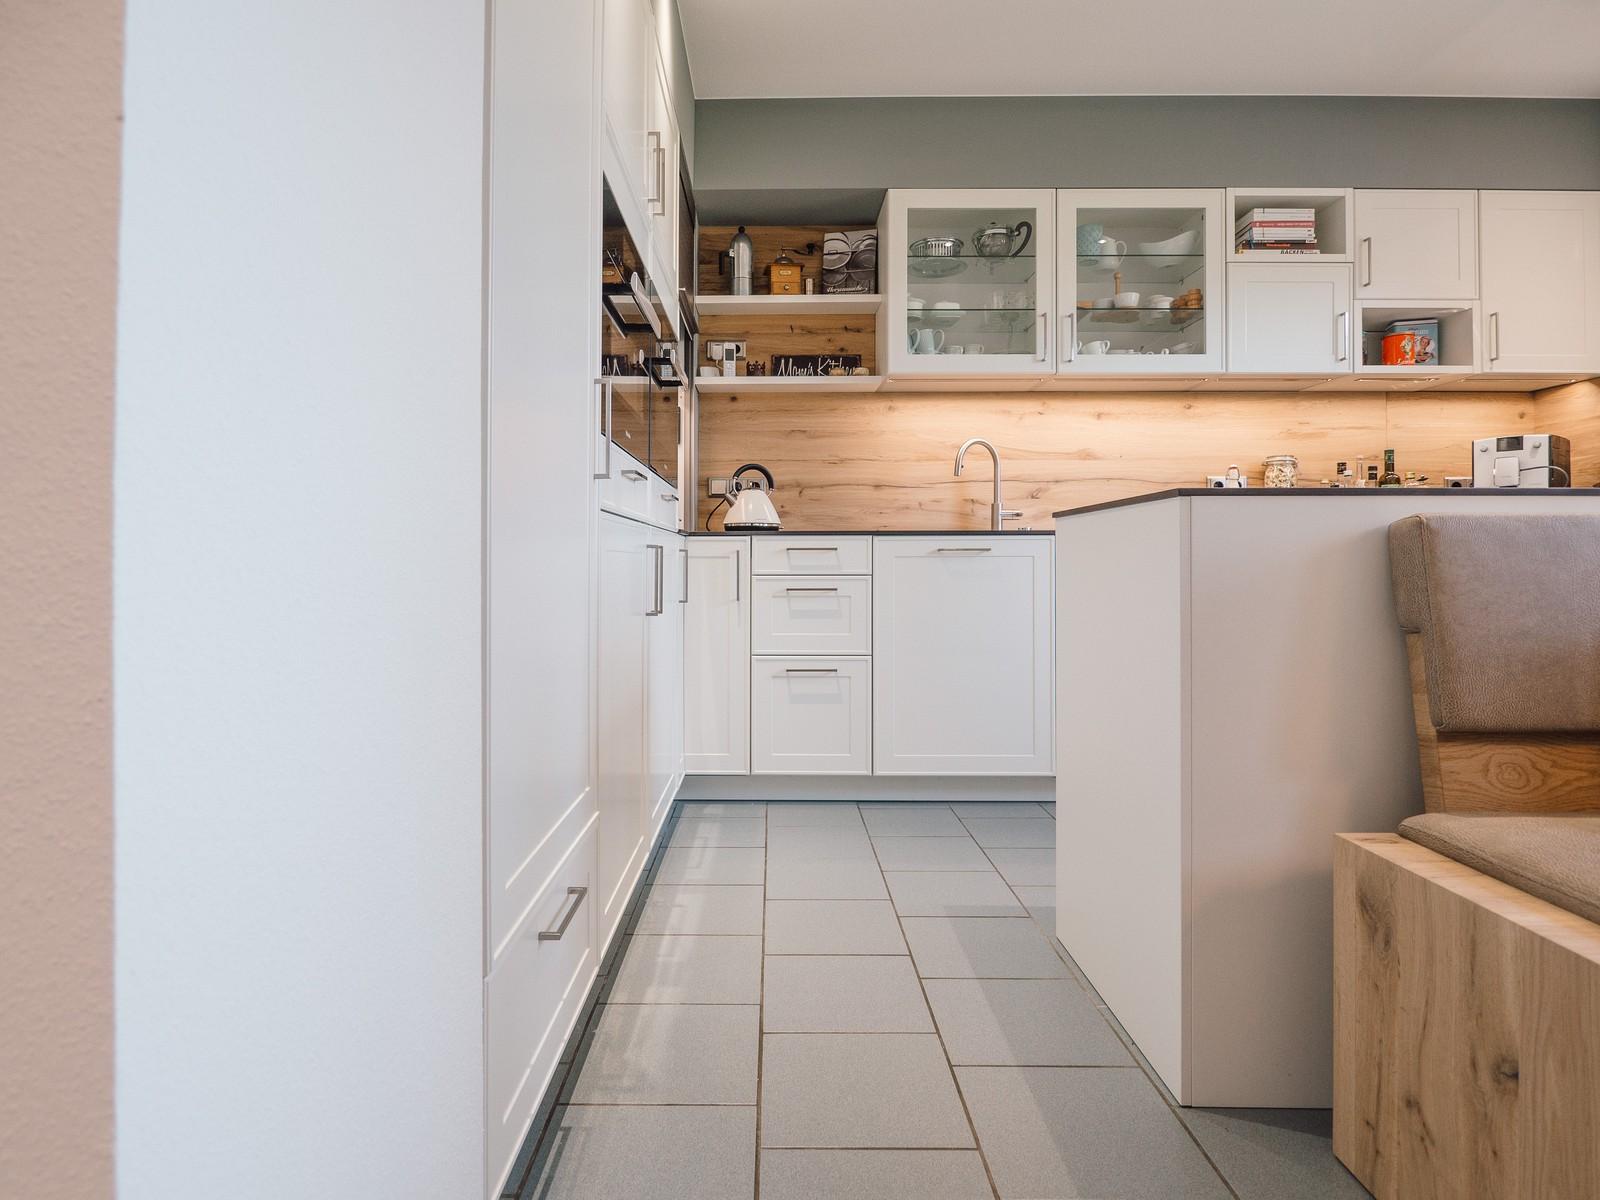 Leicht Kueche Keramik Arbeitsplatte Miele Eiche Altholz Tisch Sitzbank Tischlerei Kuechenhaus Kuechenstudio 1